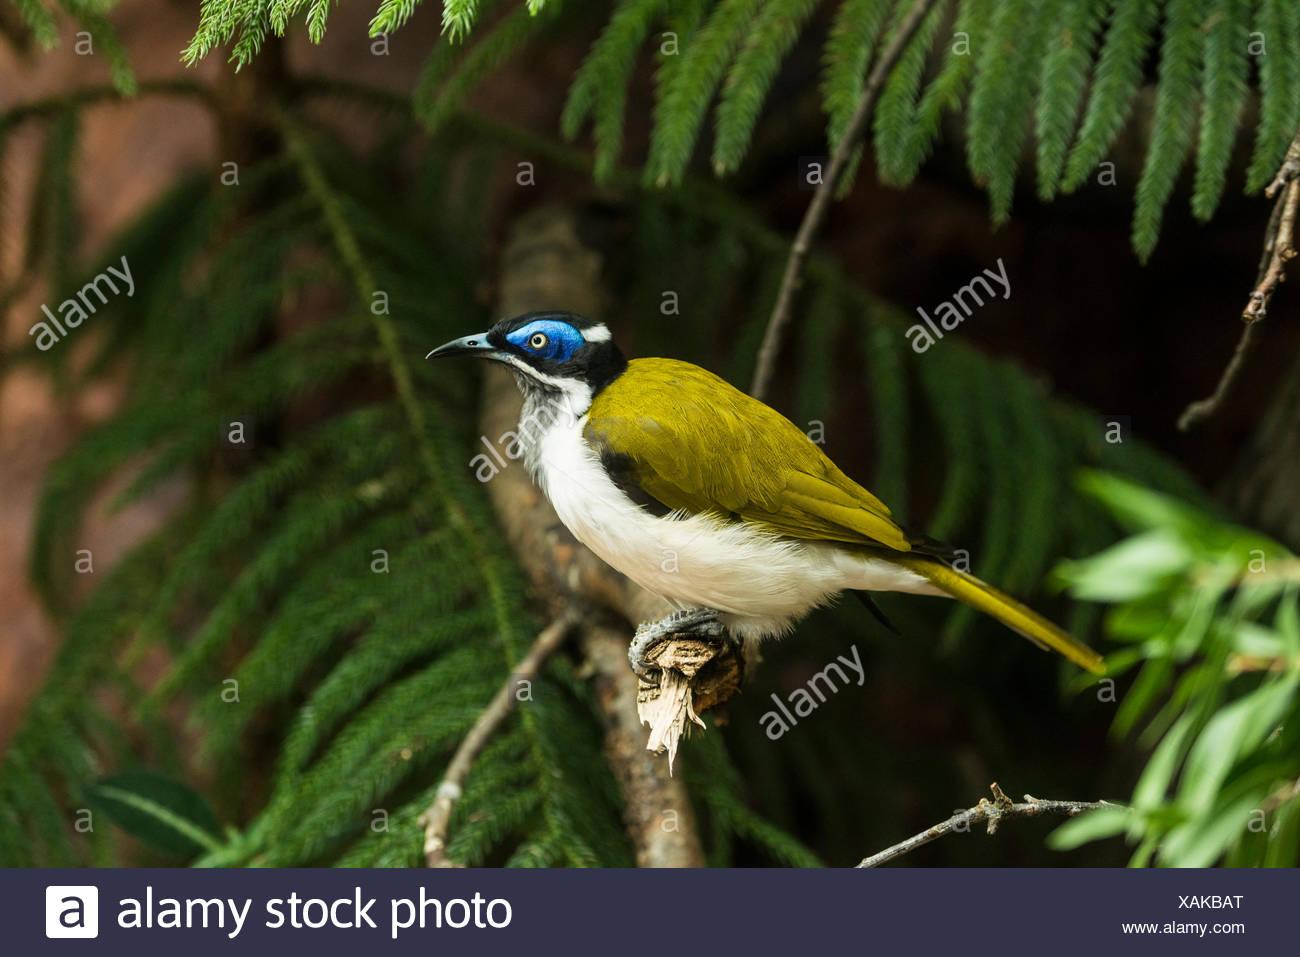 blue faced honeyeater, Entomyzon cyanotis, honeyeater, bird - Stock Image